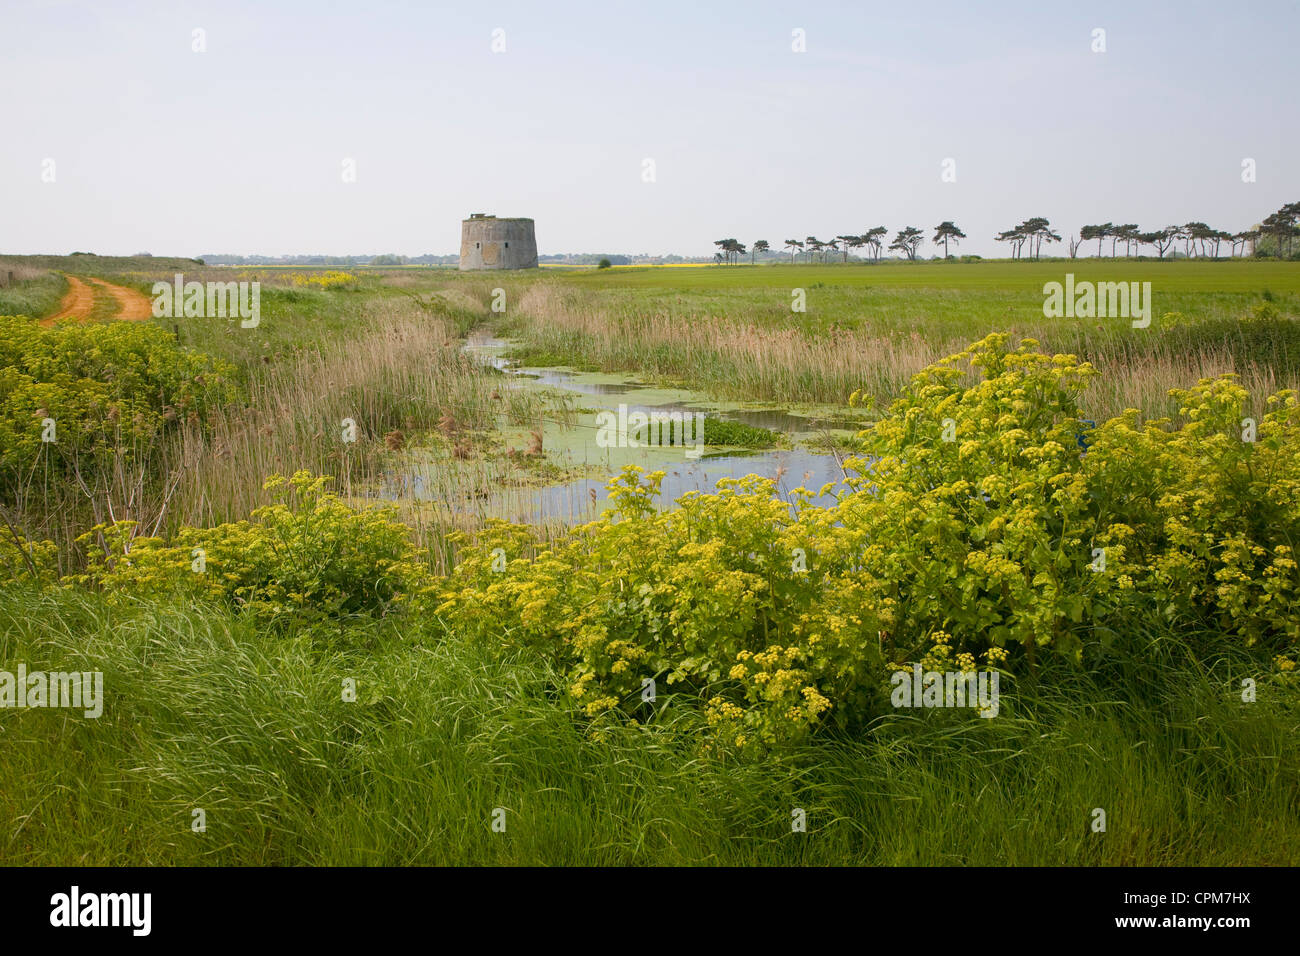 Drainage ditch draining marshes Alderton, Suffolk, England - Stock Image